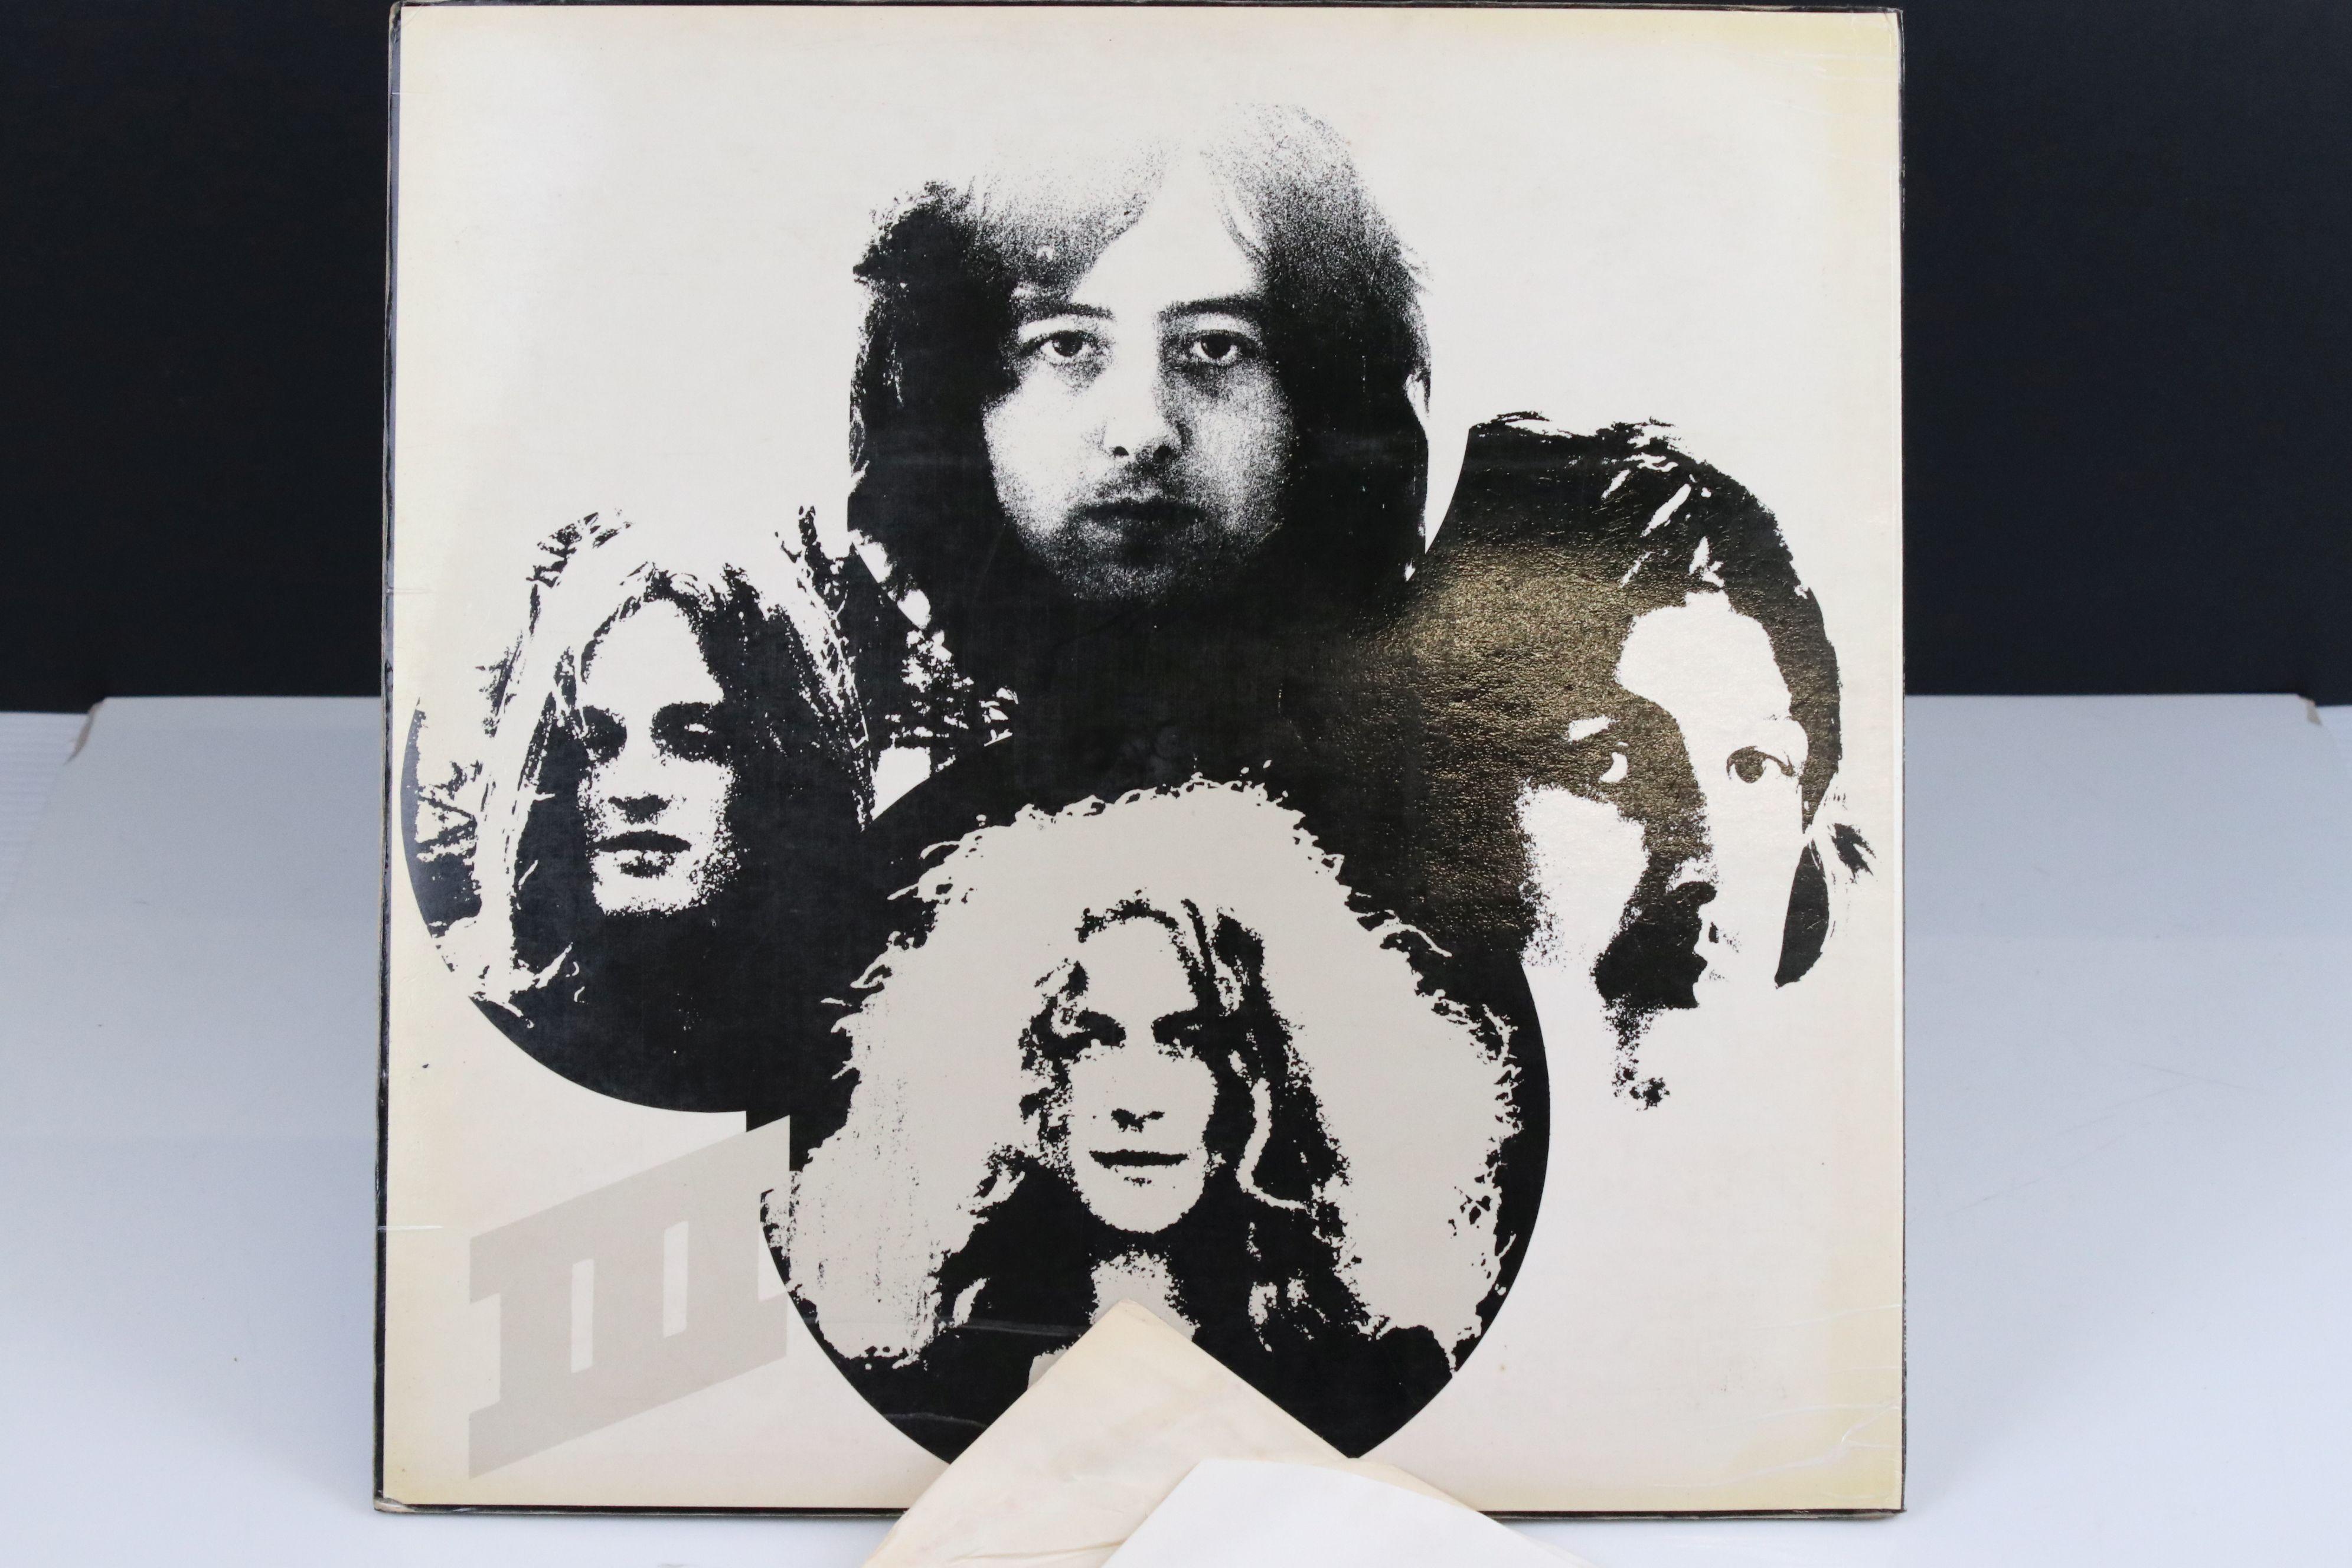 Vinyl - Led Zeppelin III LP on Atlantic Deluxe 2401002 red/maroon label, 1st pressing, sleeve vg - Image 7 of 7